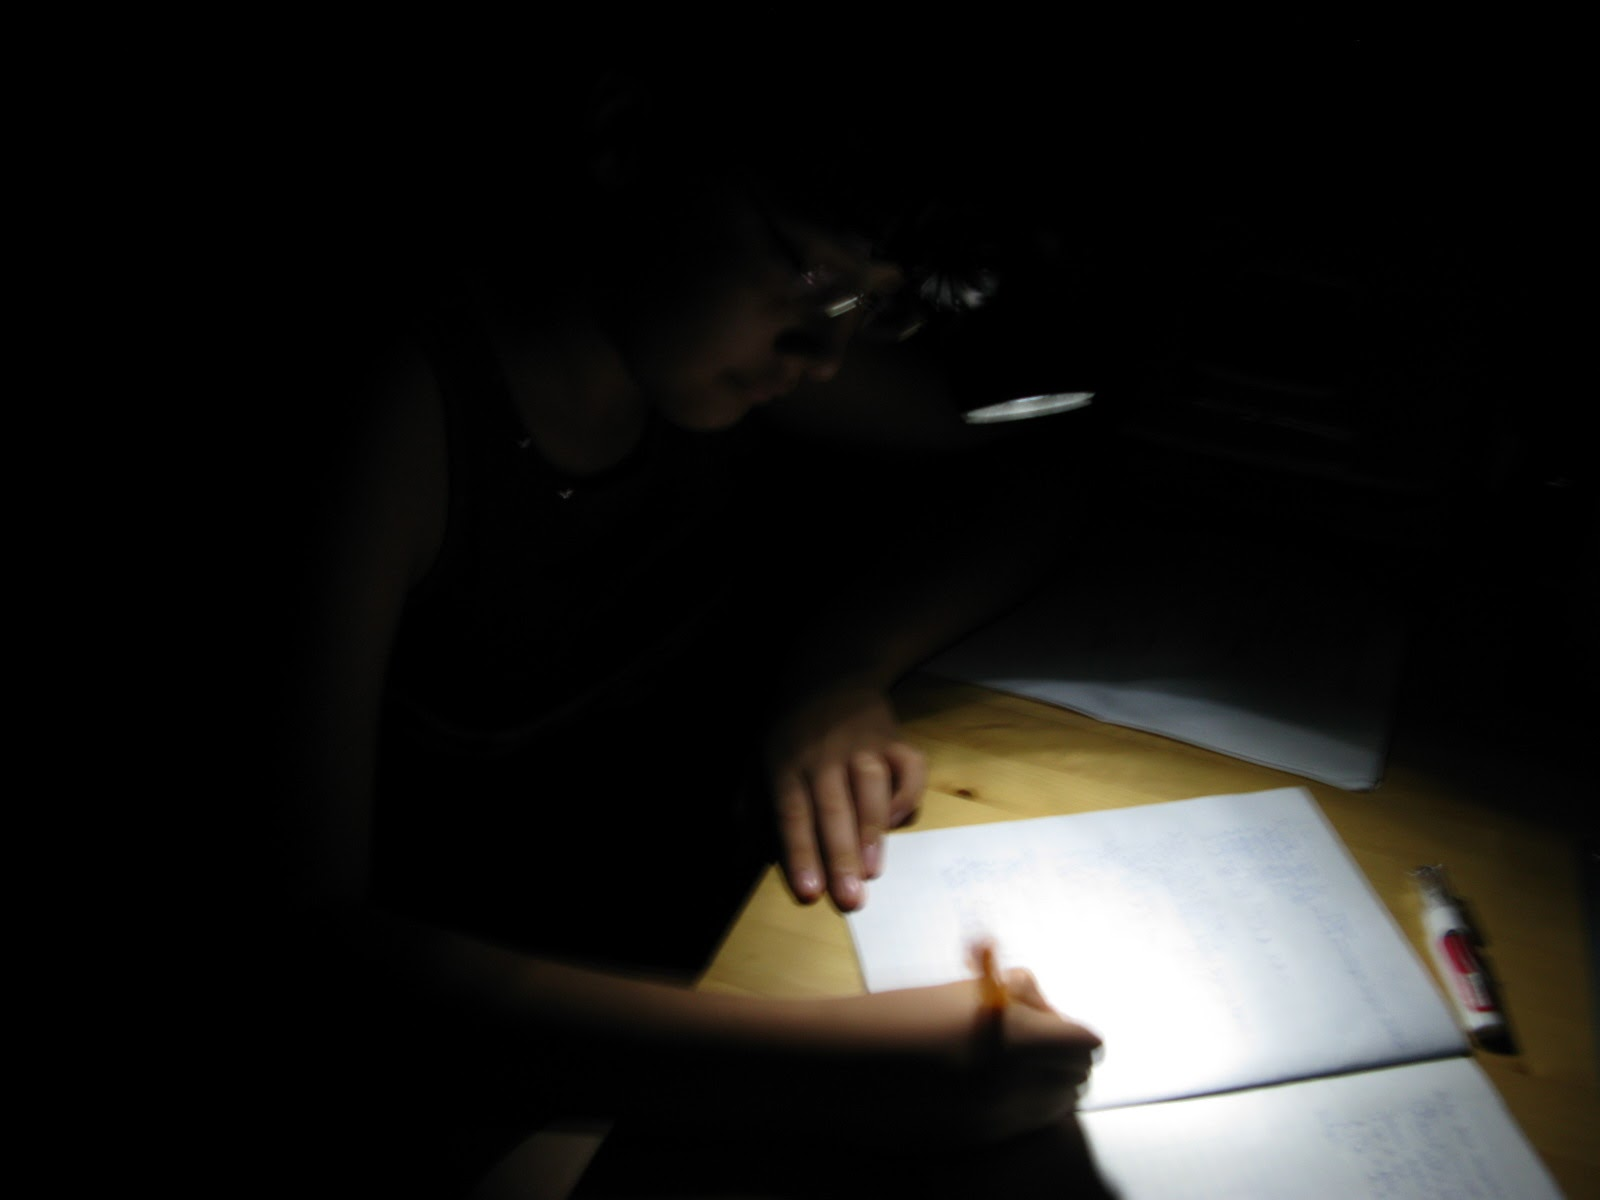 girl working on homework using head lamp